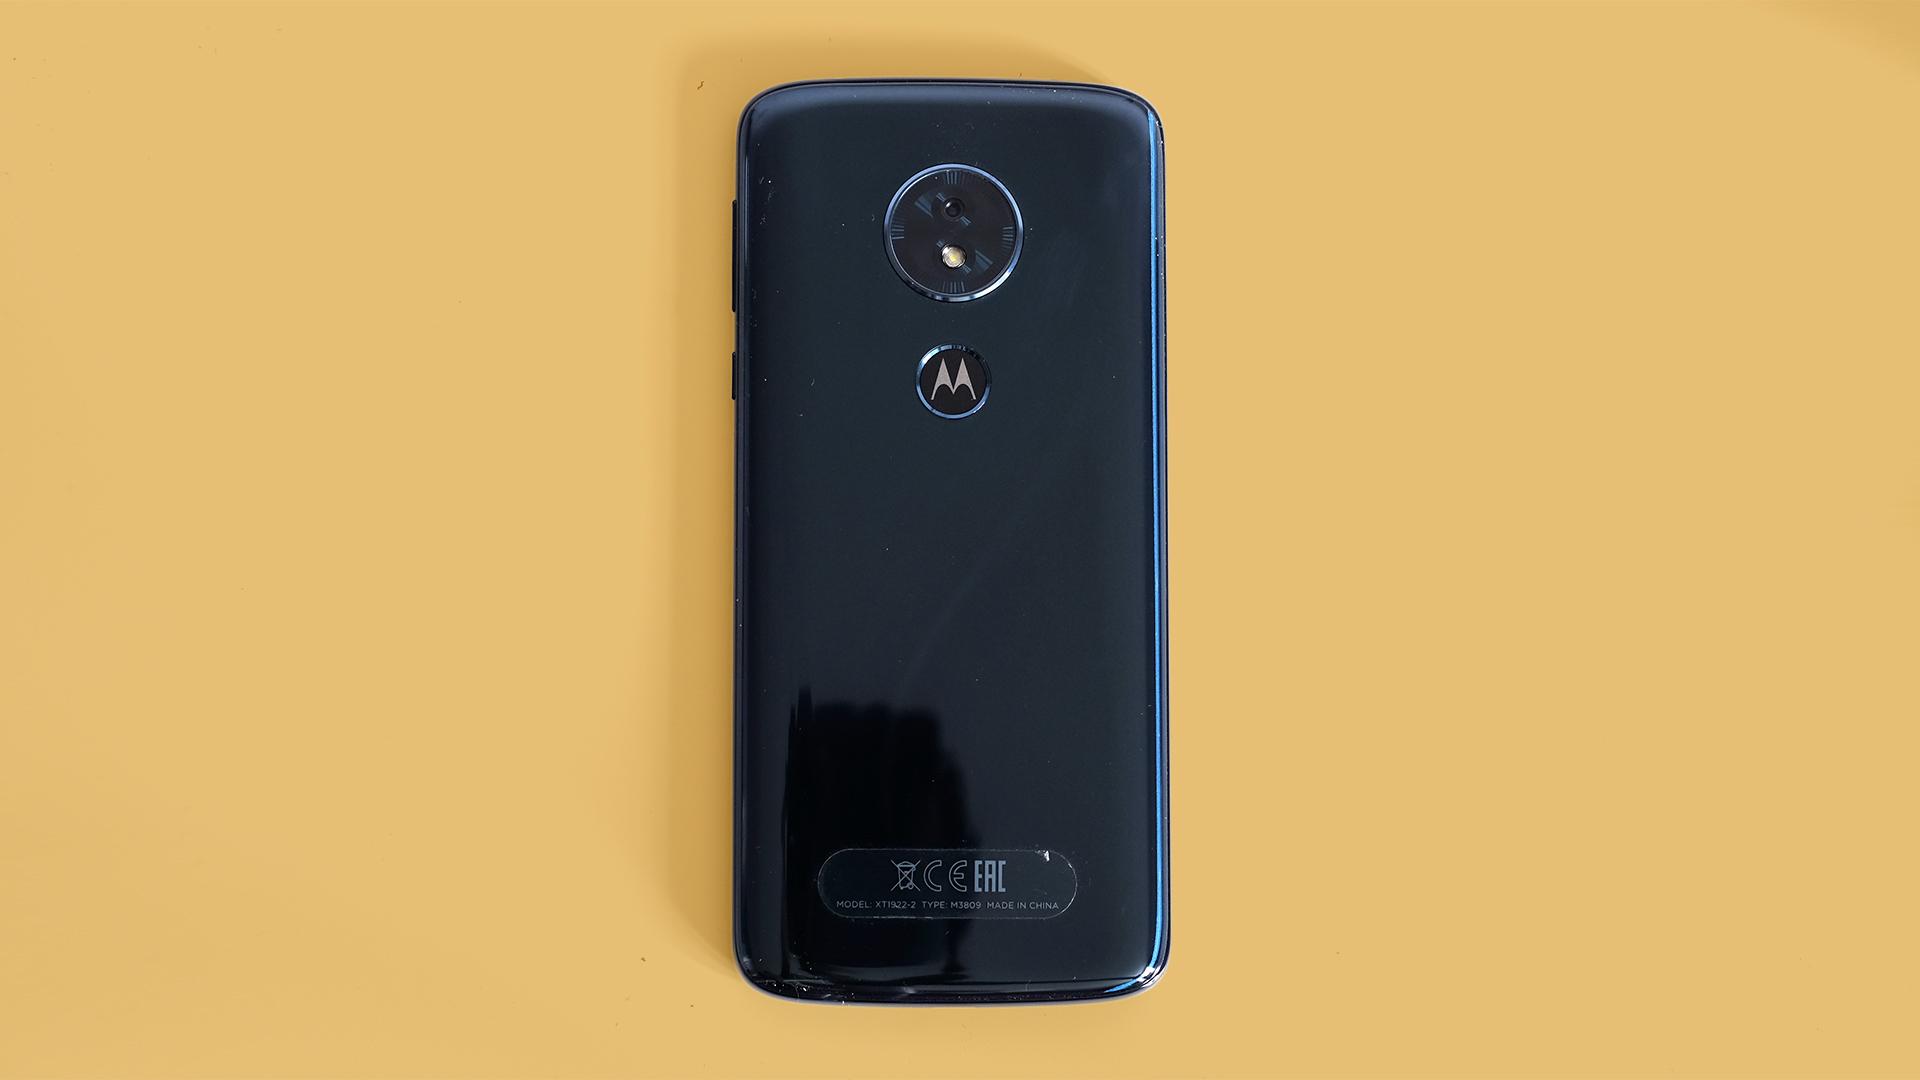 Moto G6 Play review | Genic Media